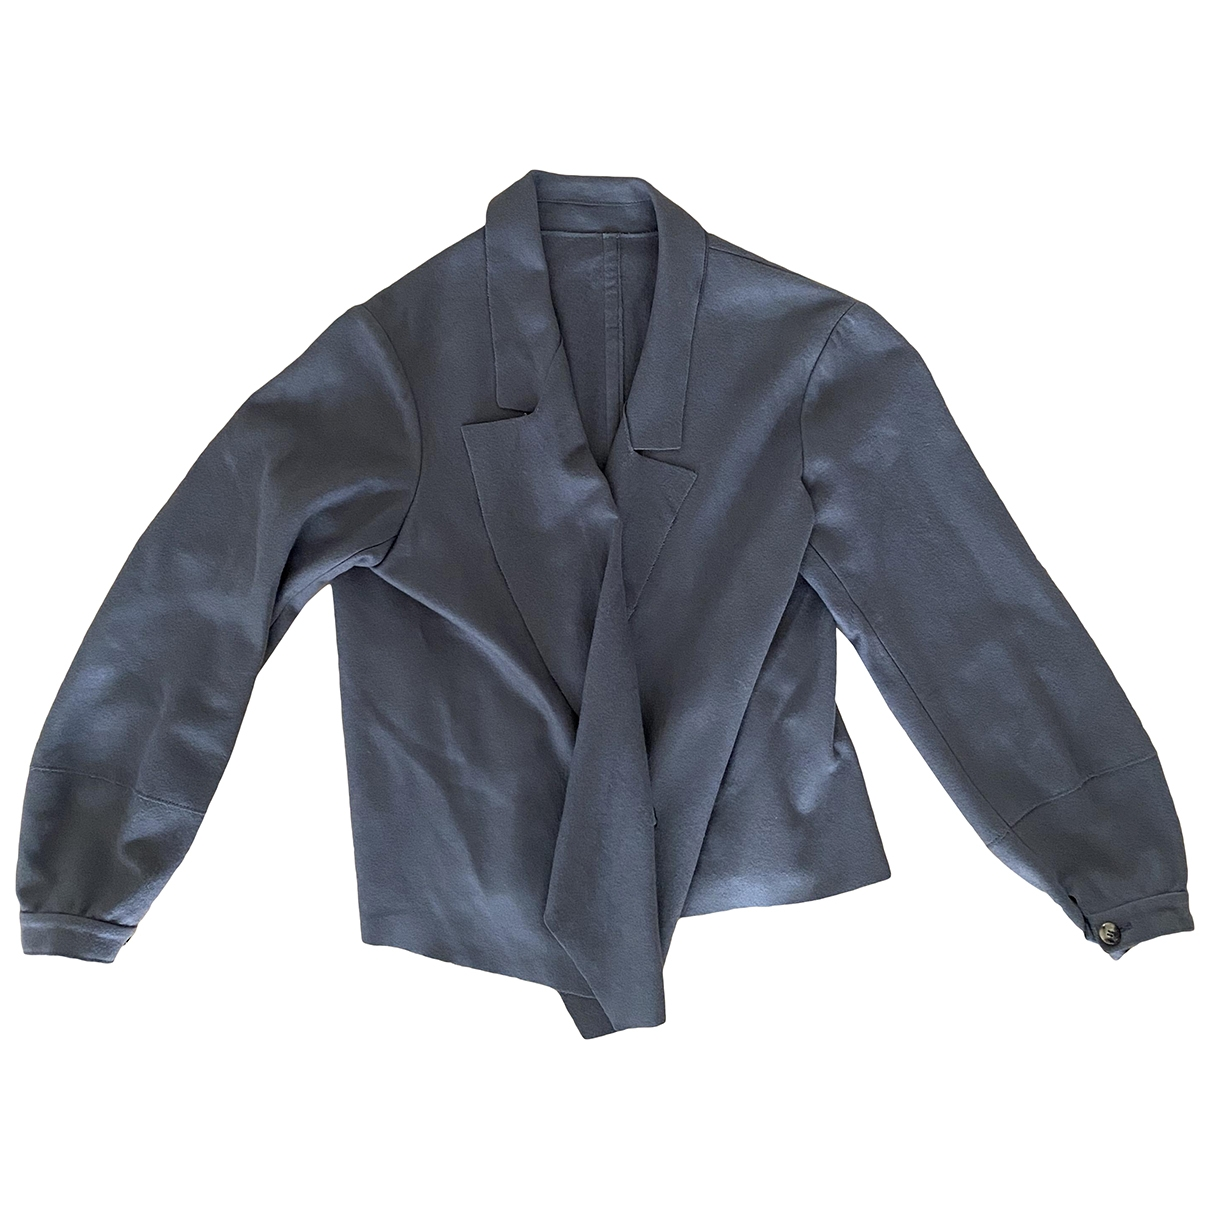 Yves Saint Laurent \N Grey Cashmere jacket for Women 46 FR